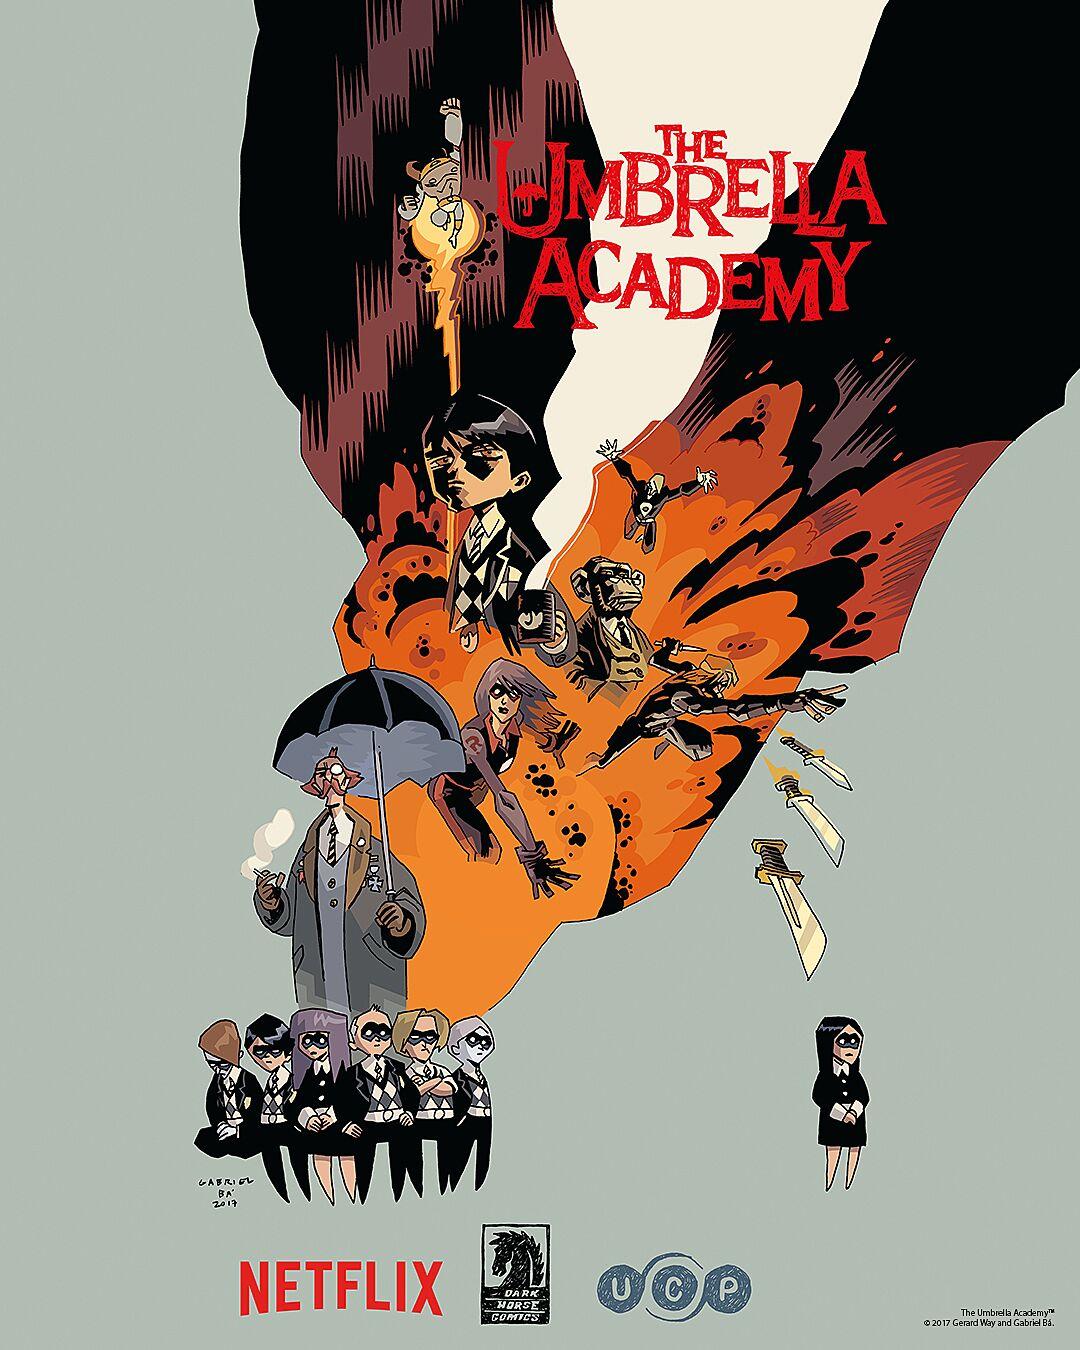 Umbrella Academy Season 2: If it follows the comics